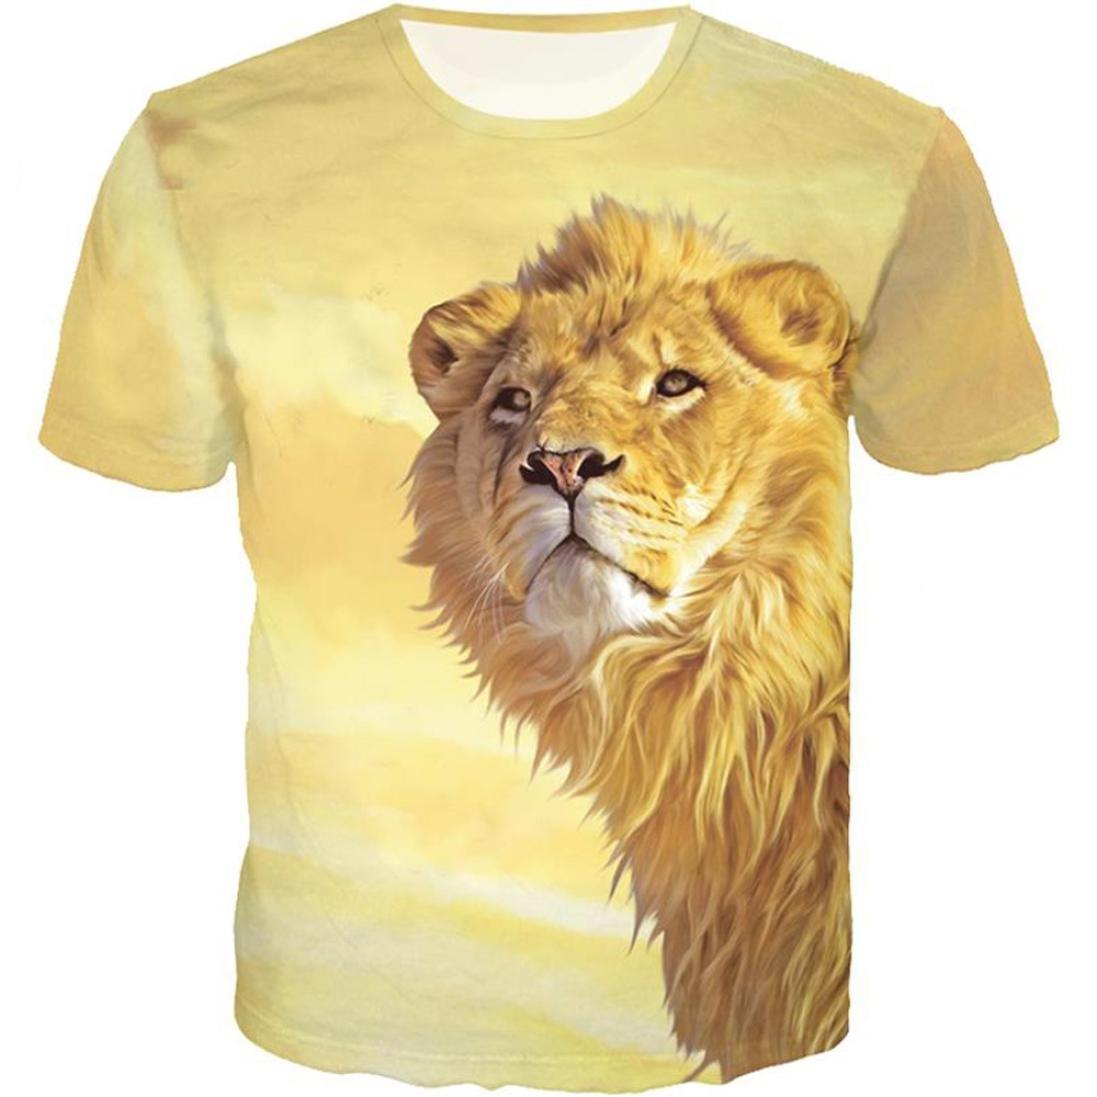 7278797d50 vermers Clearance Deals Mens Tees Shirt Fashion Lion 3D Printing Short  Sleeve T-Shirt Tops